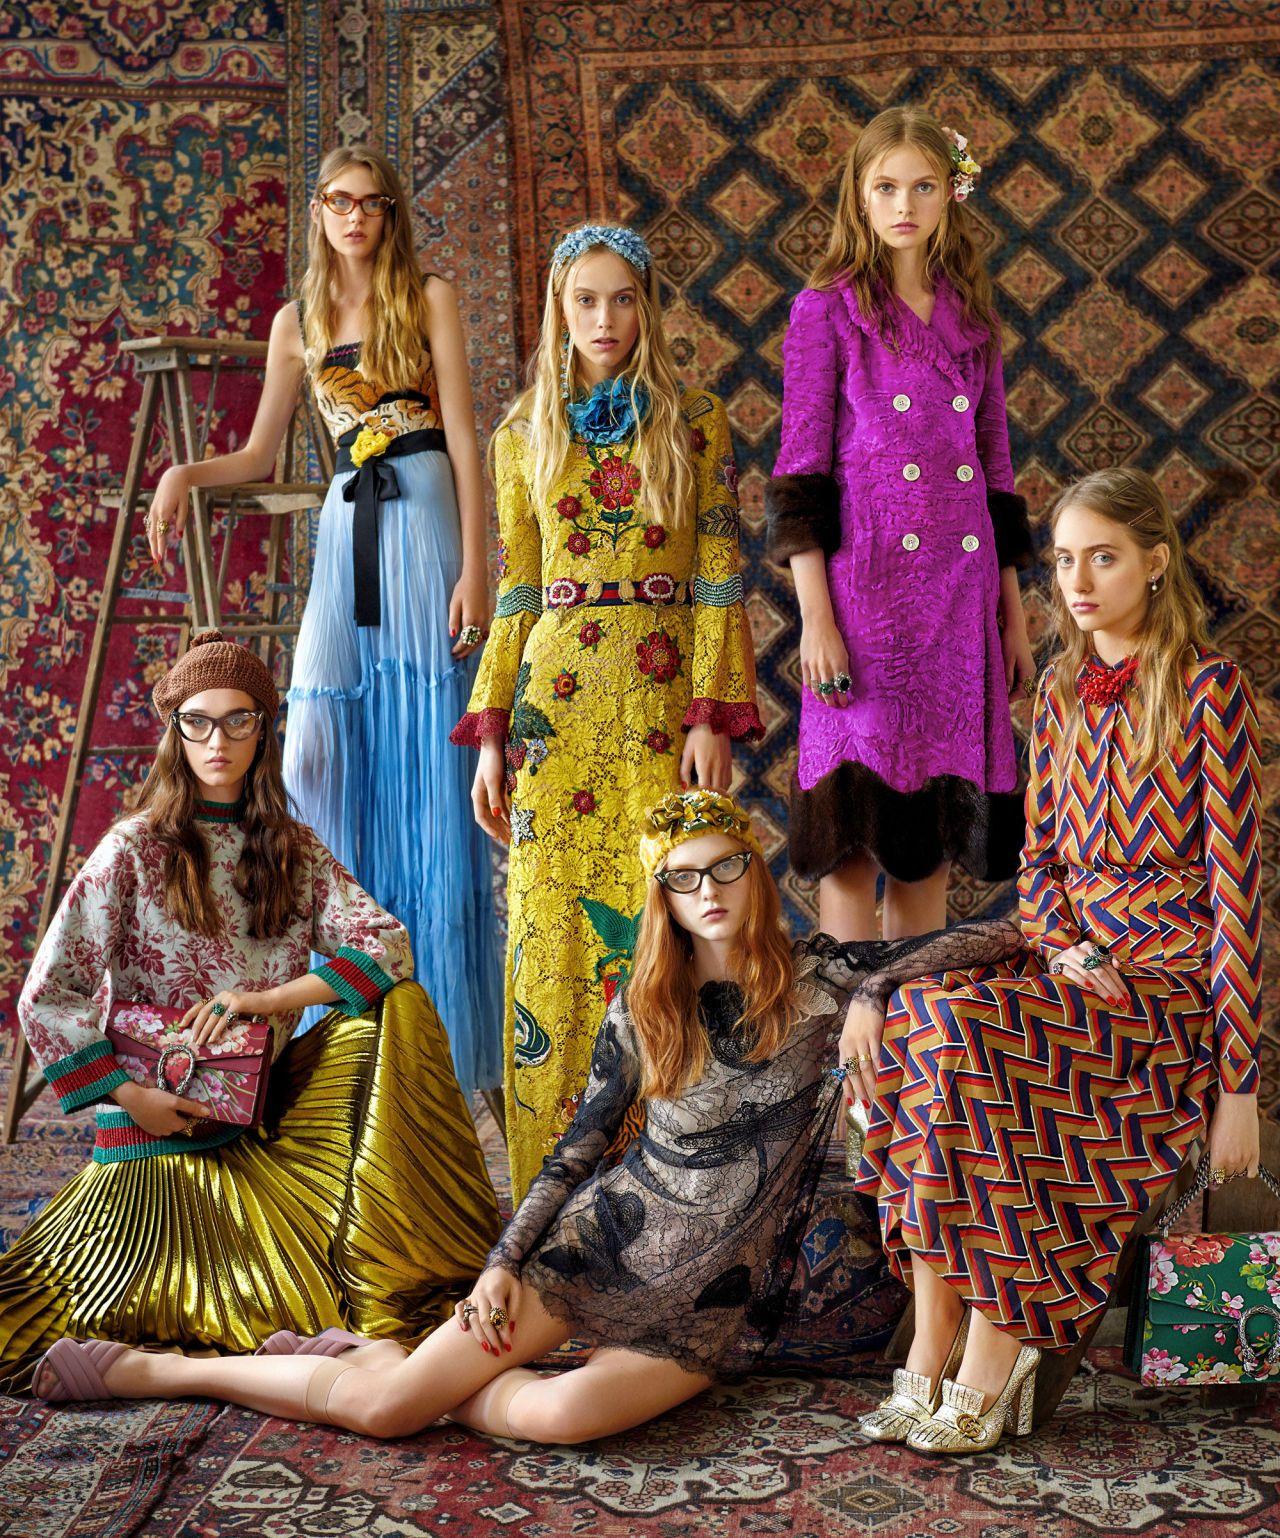 e976e0ef6 Meet Gucci's New Ring Leader   Products I Love   Fashion, Gucci ...